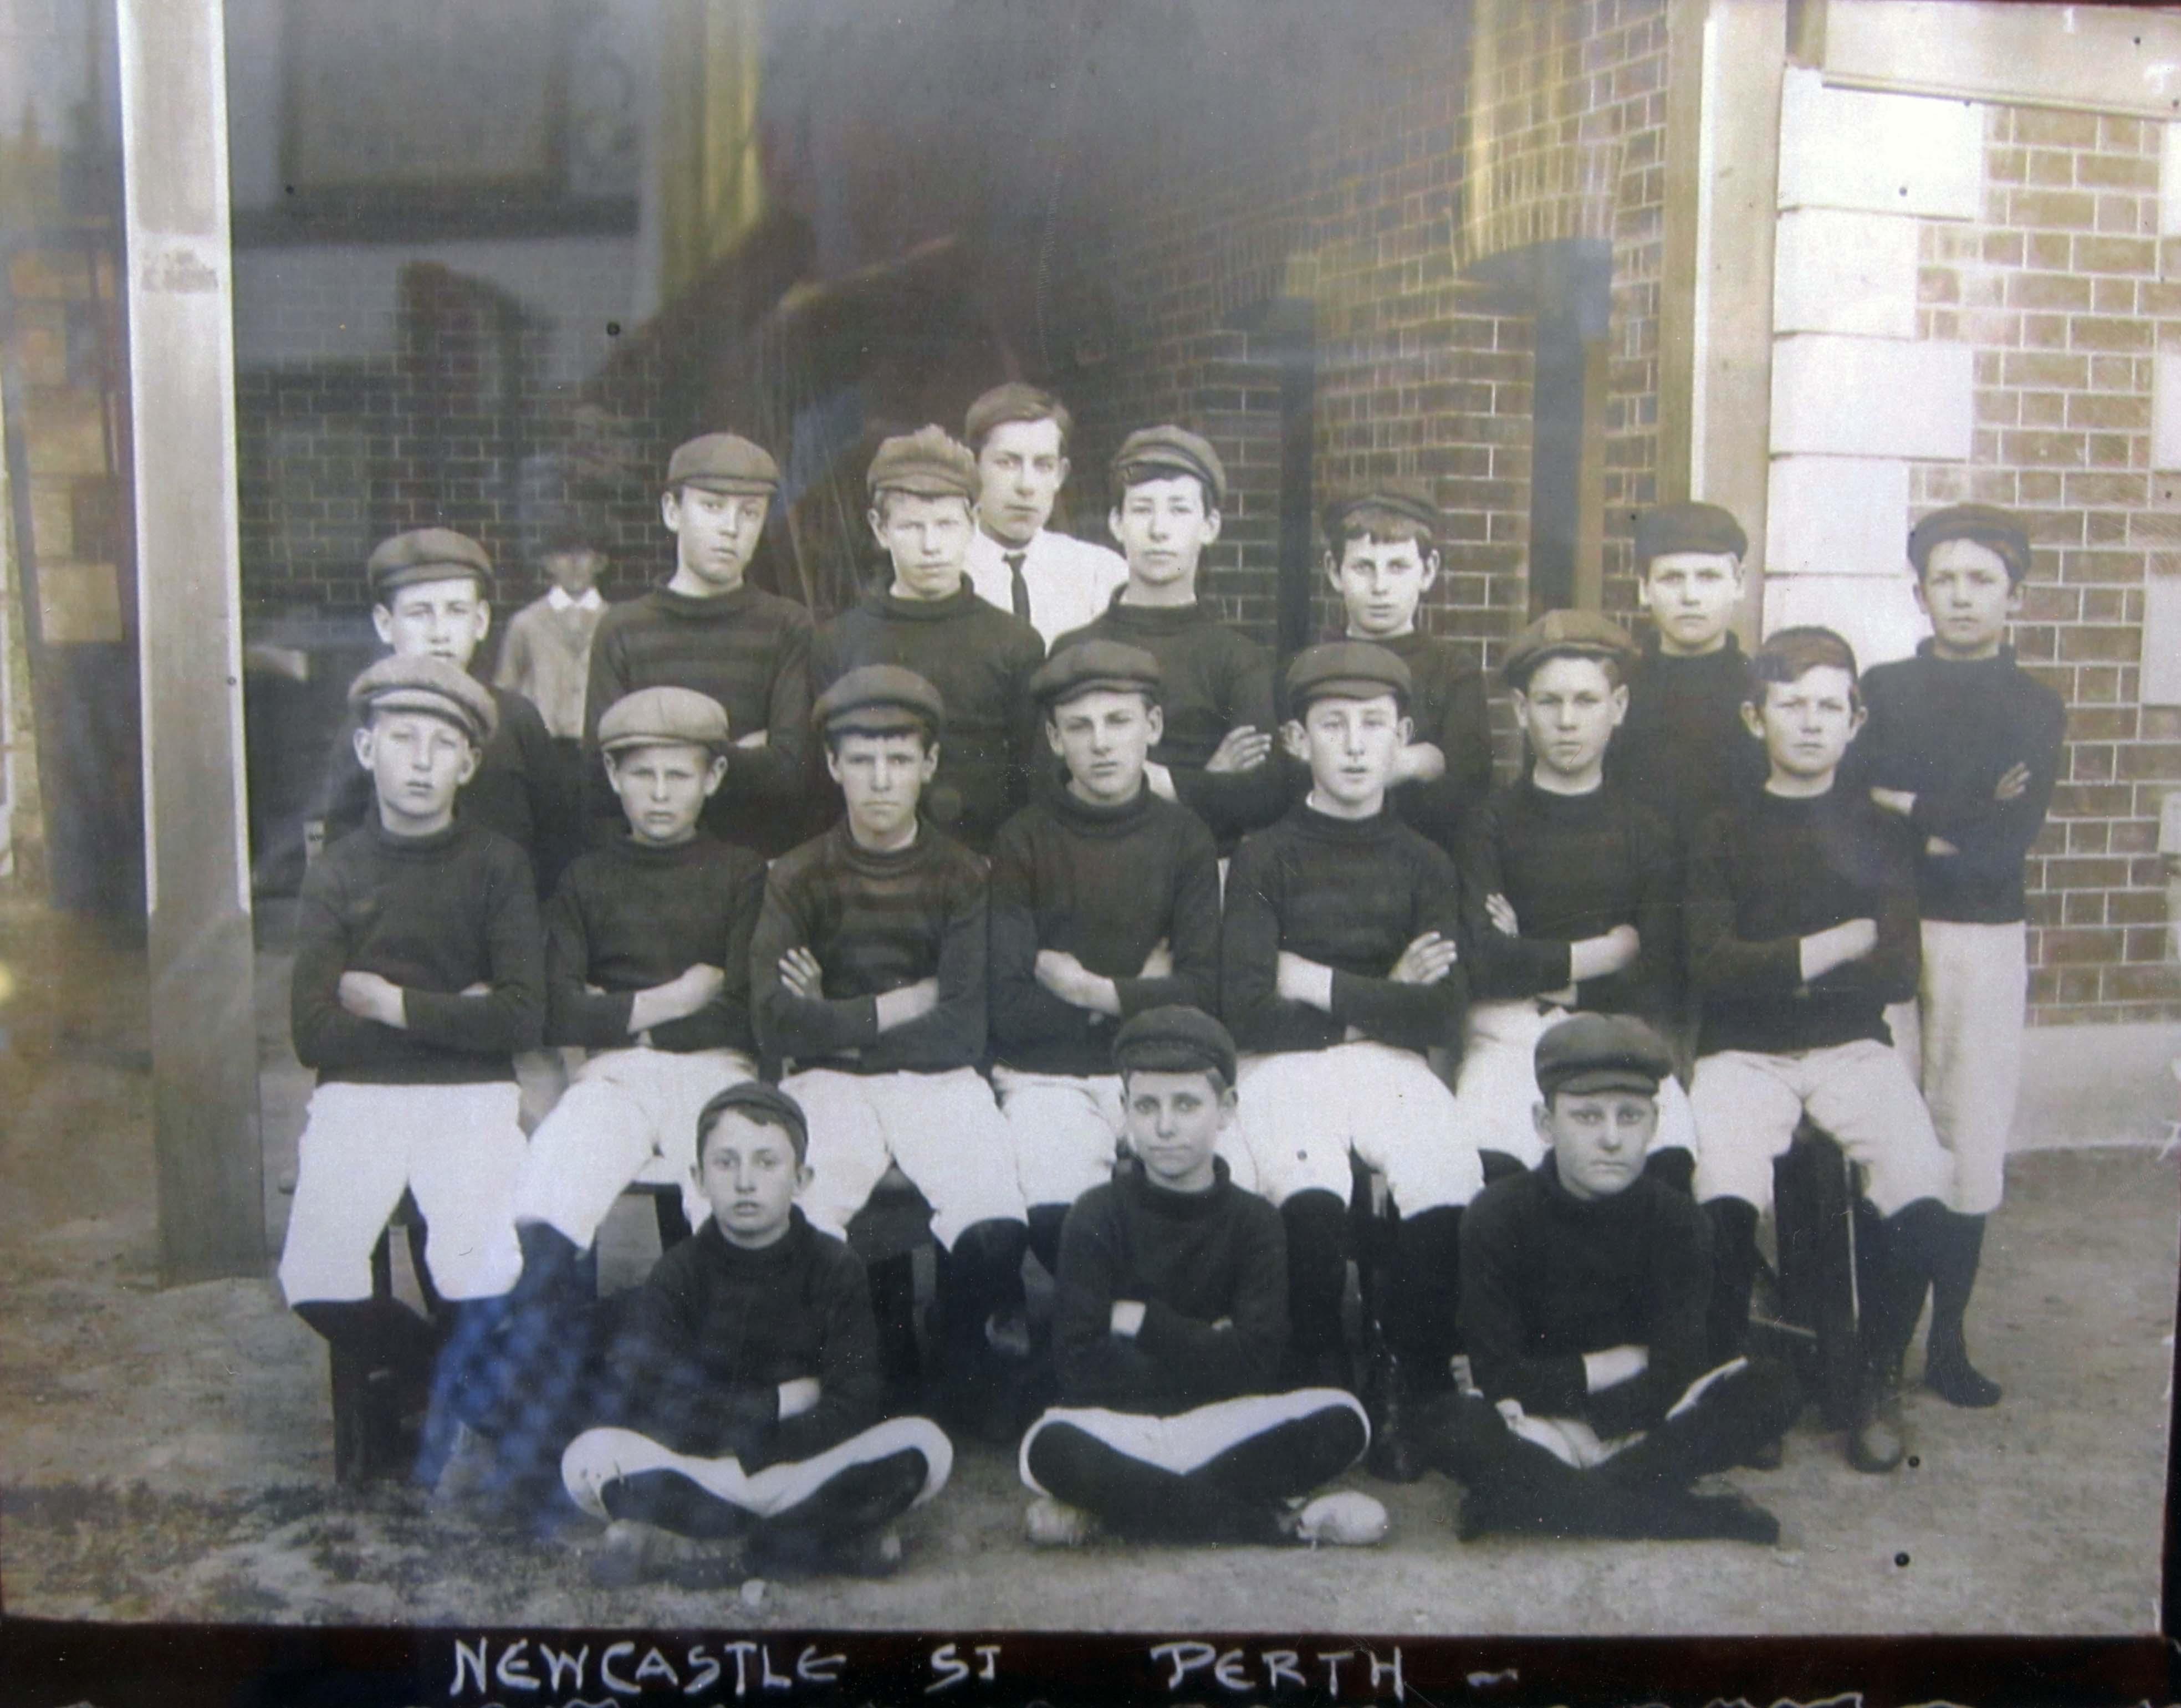 106. Newcastle St Football Team, nd